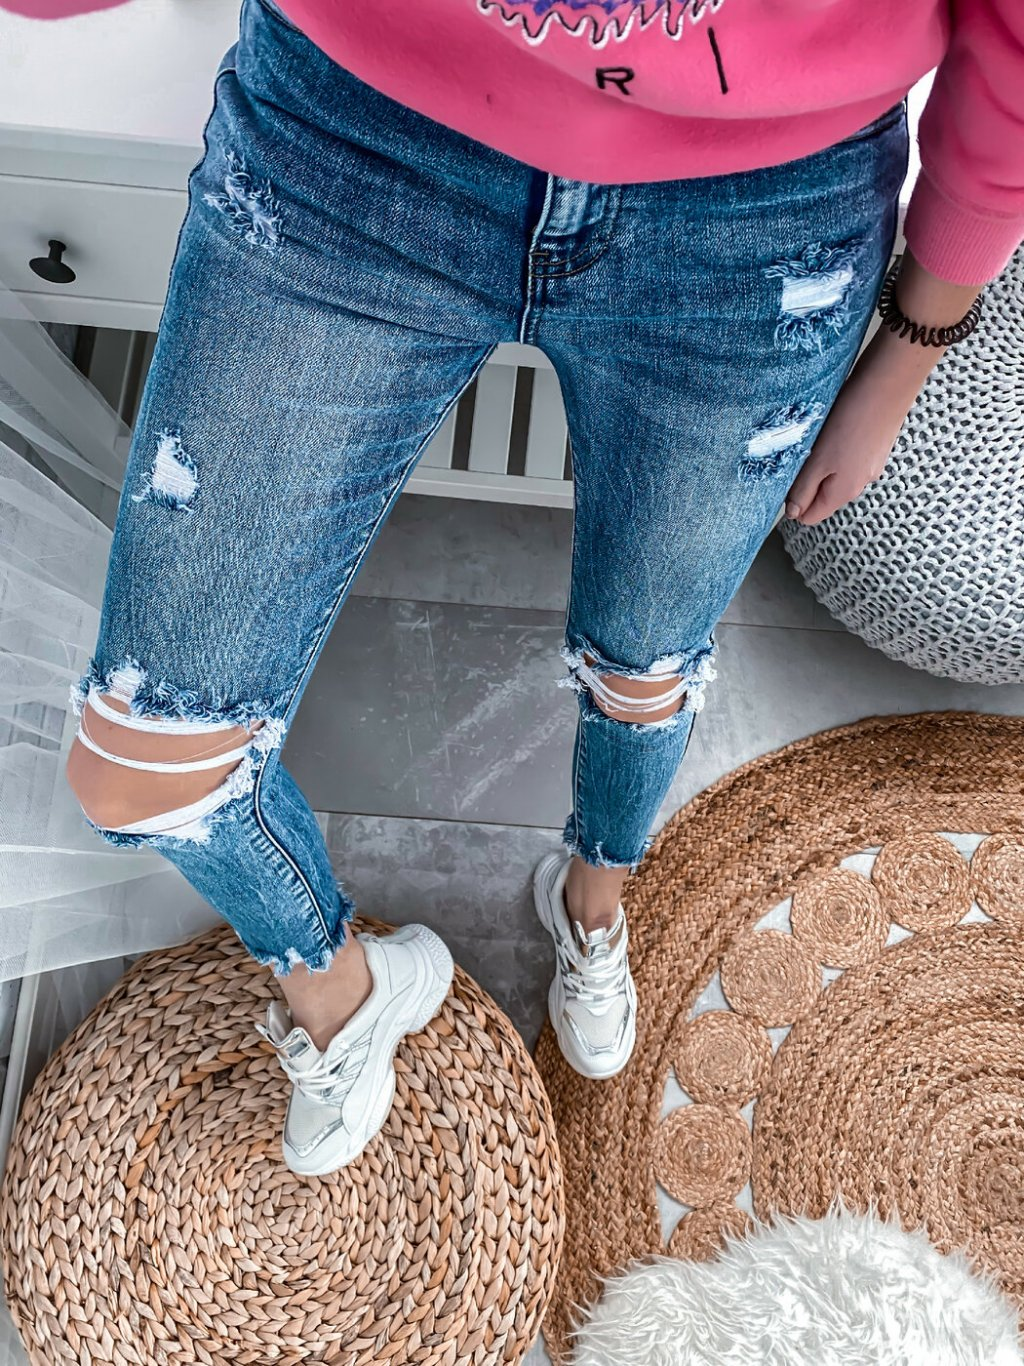 -Dámské Jeans Limited edition SIMPLY XS